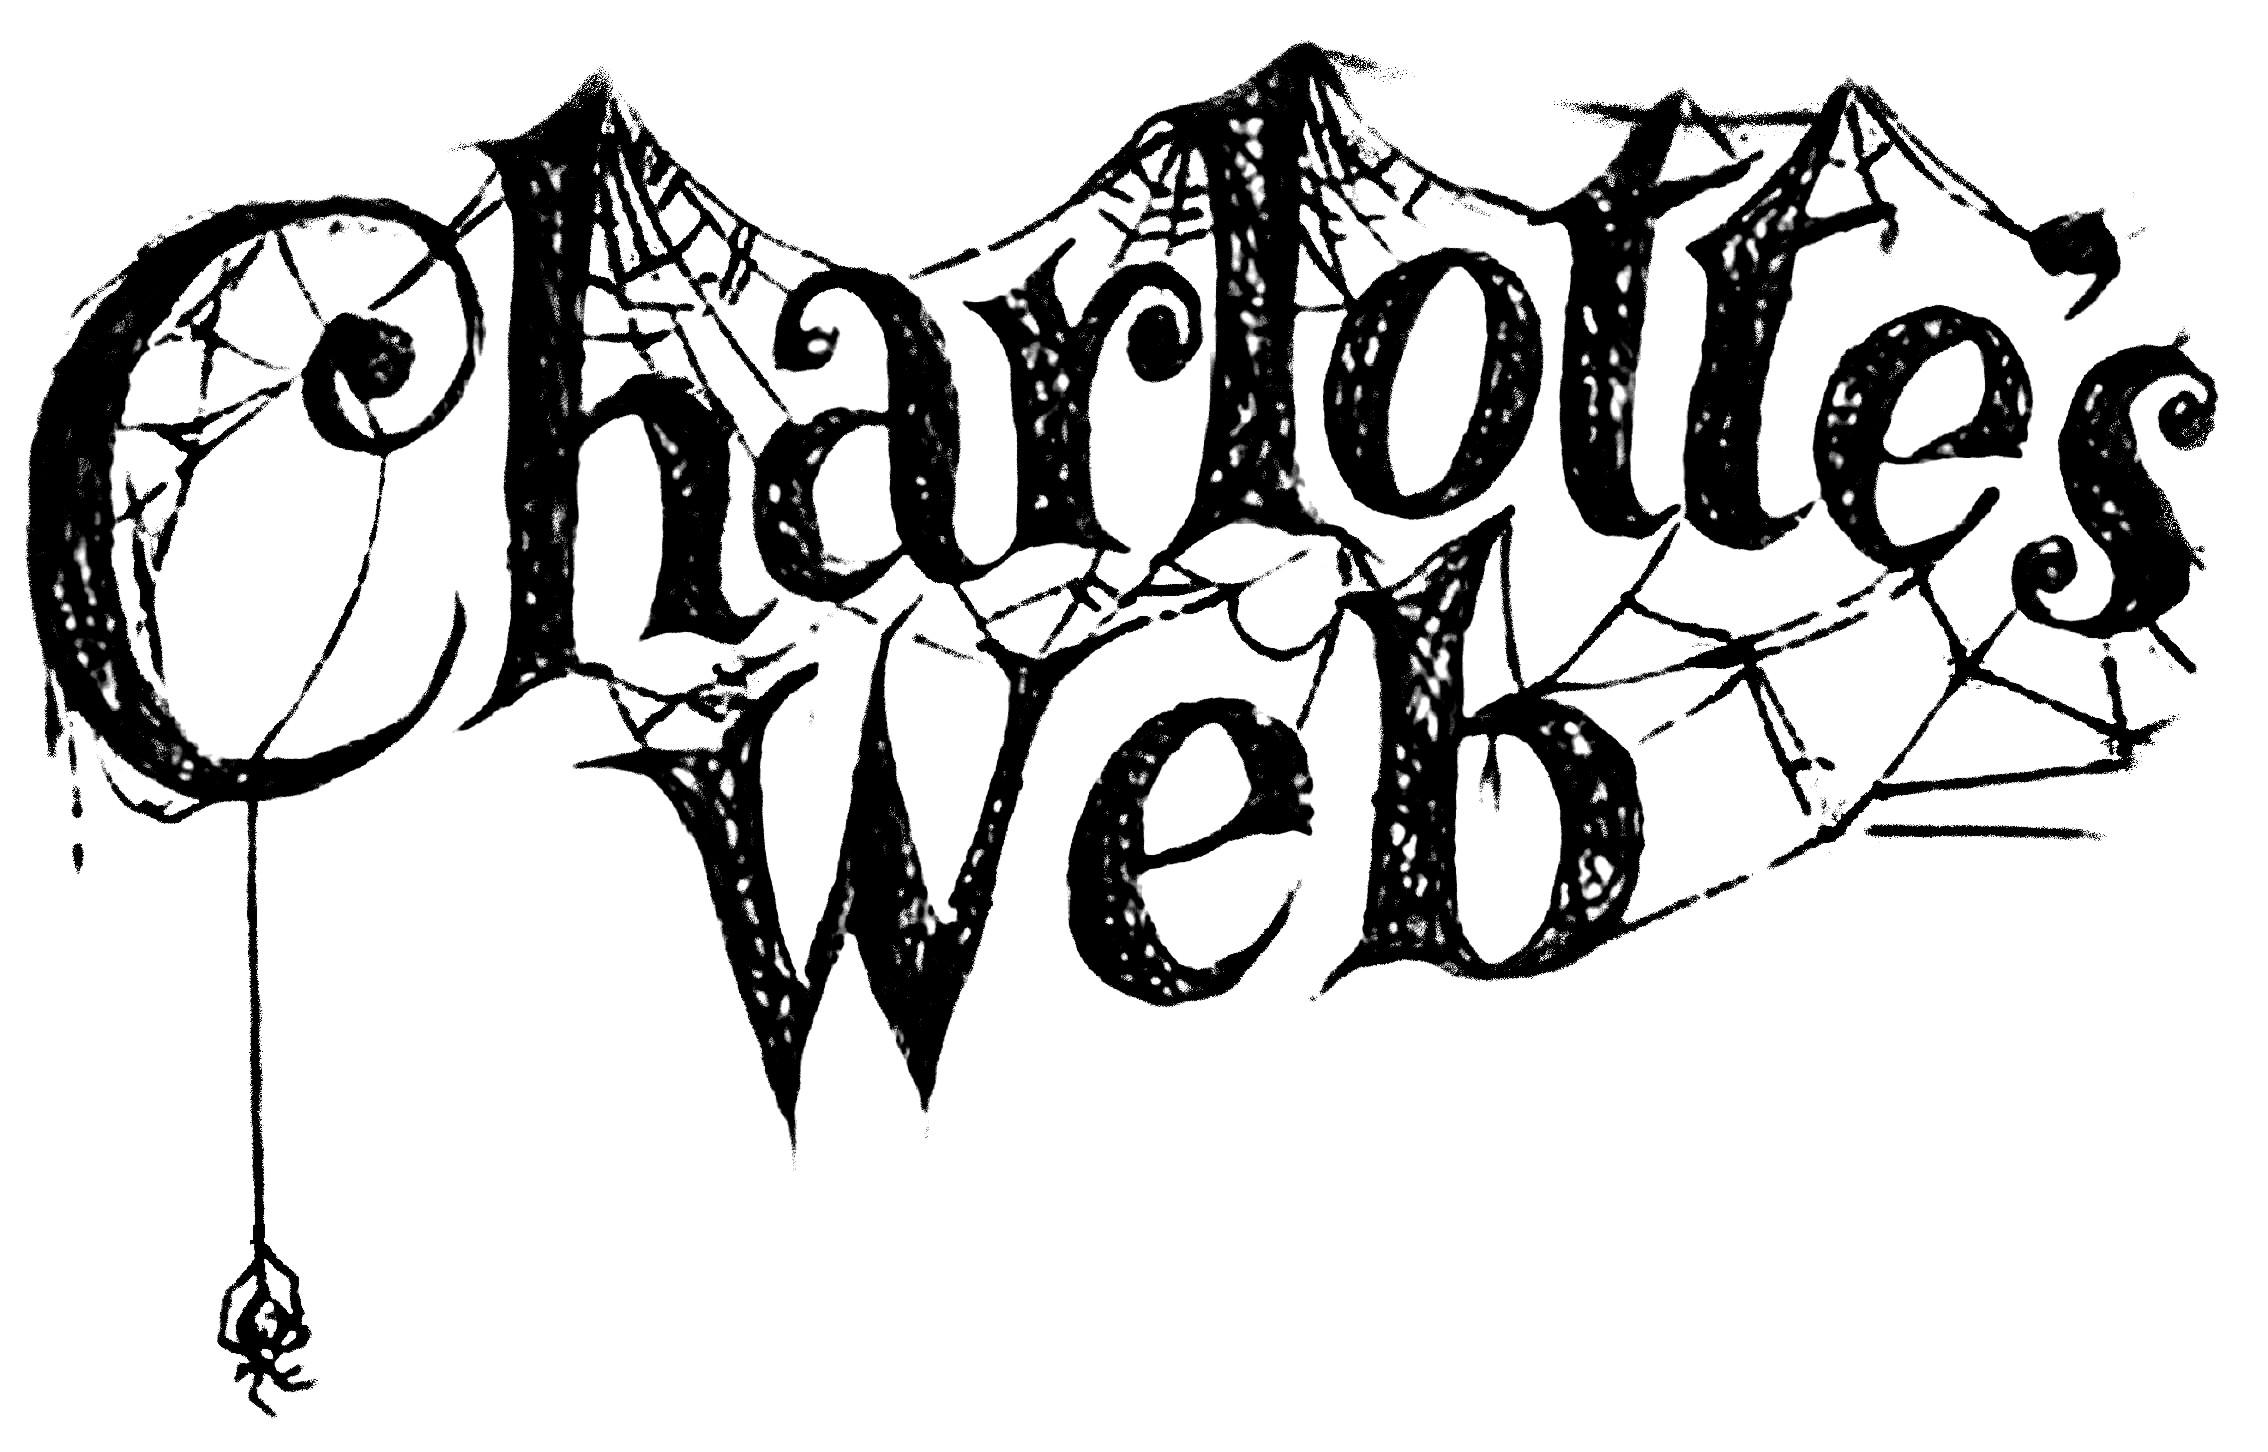 13 Charlotte's Web Font Images